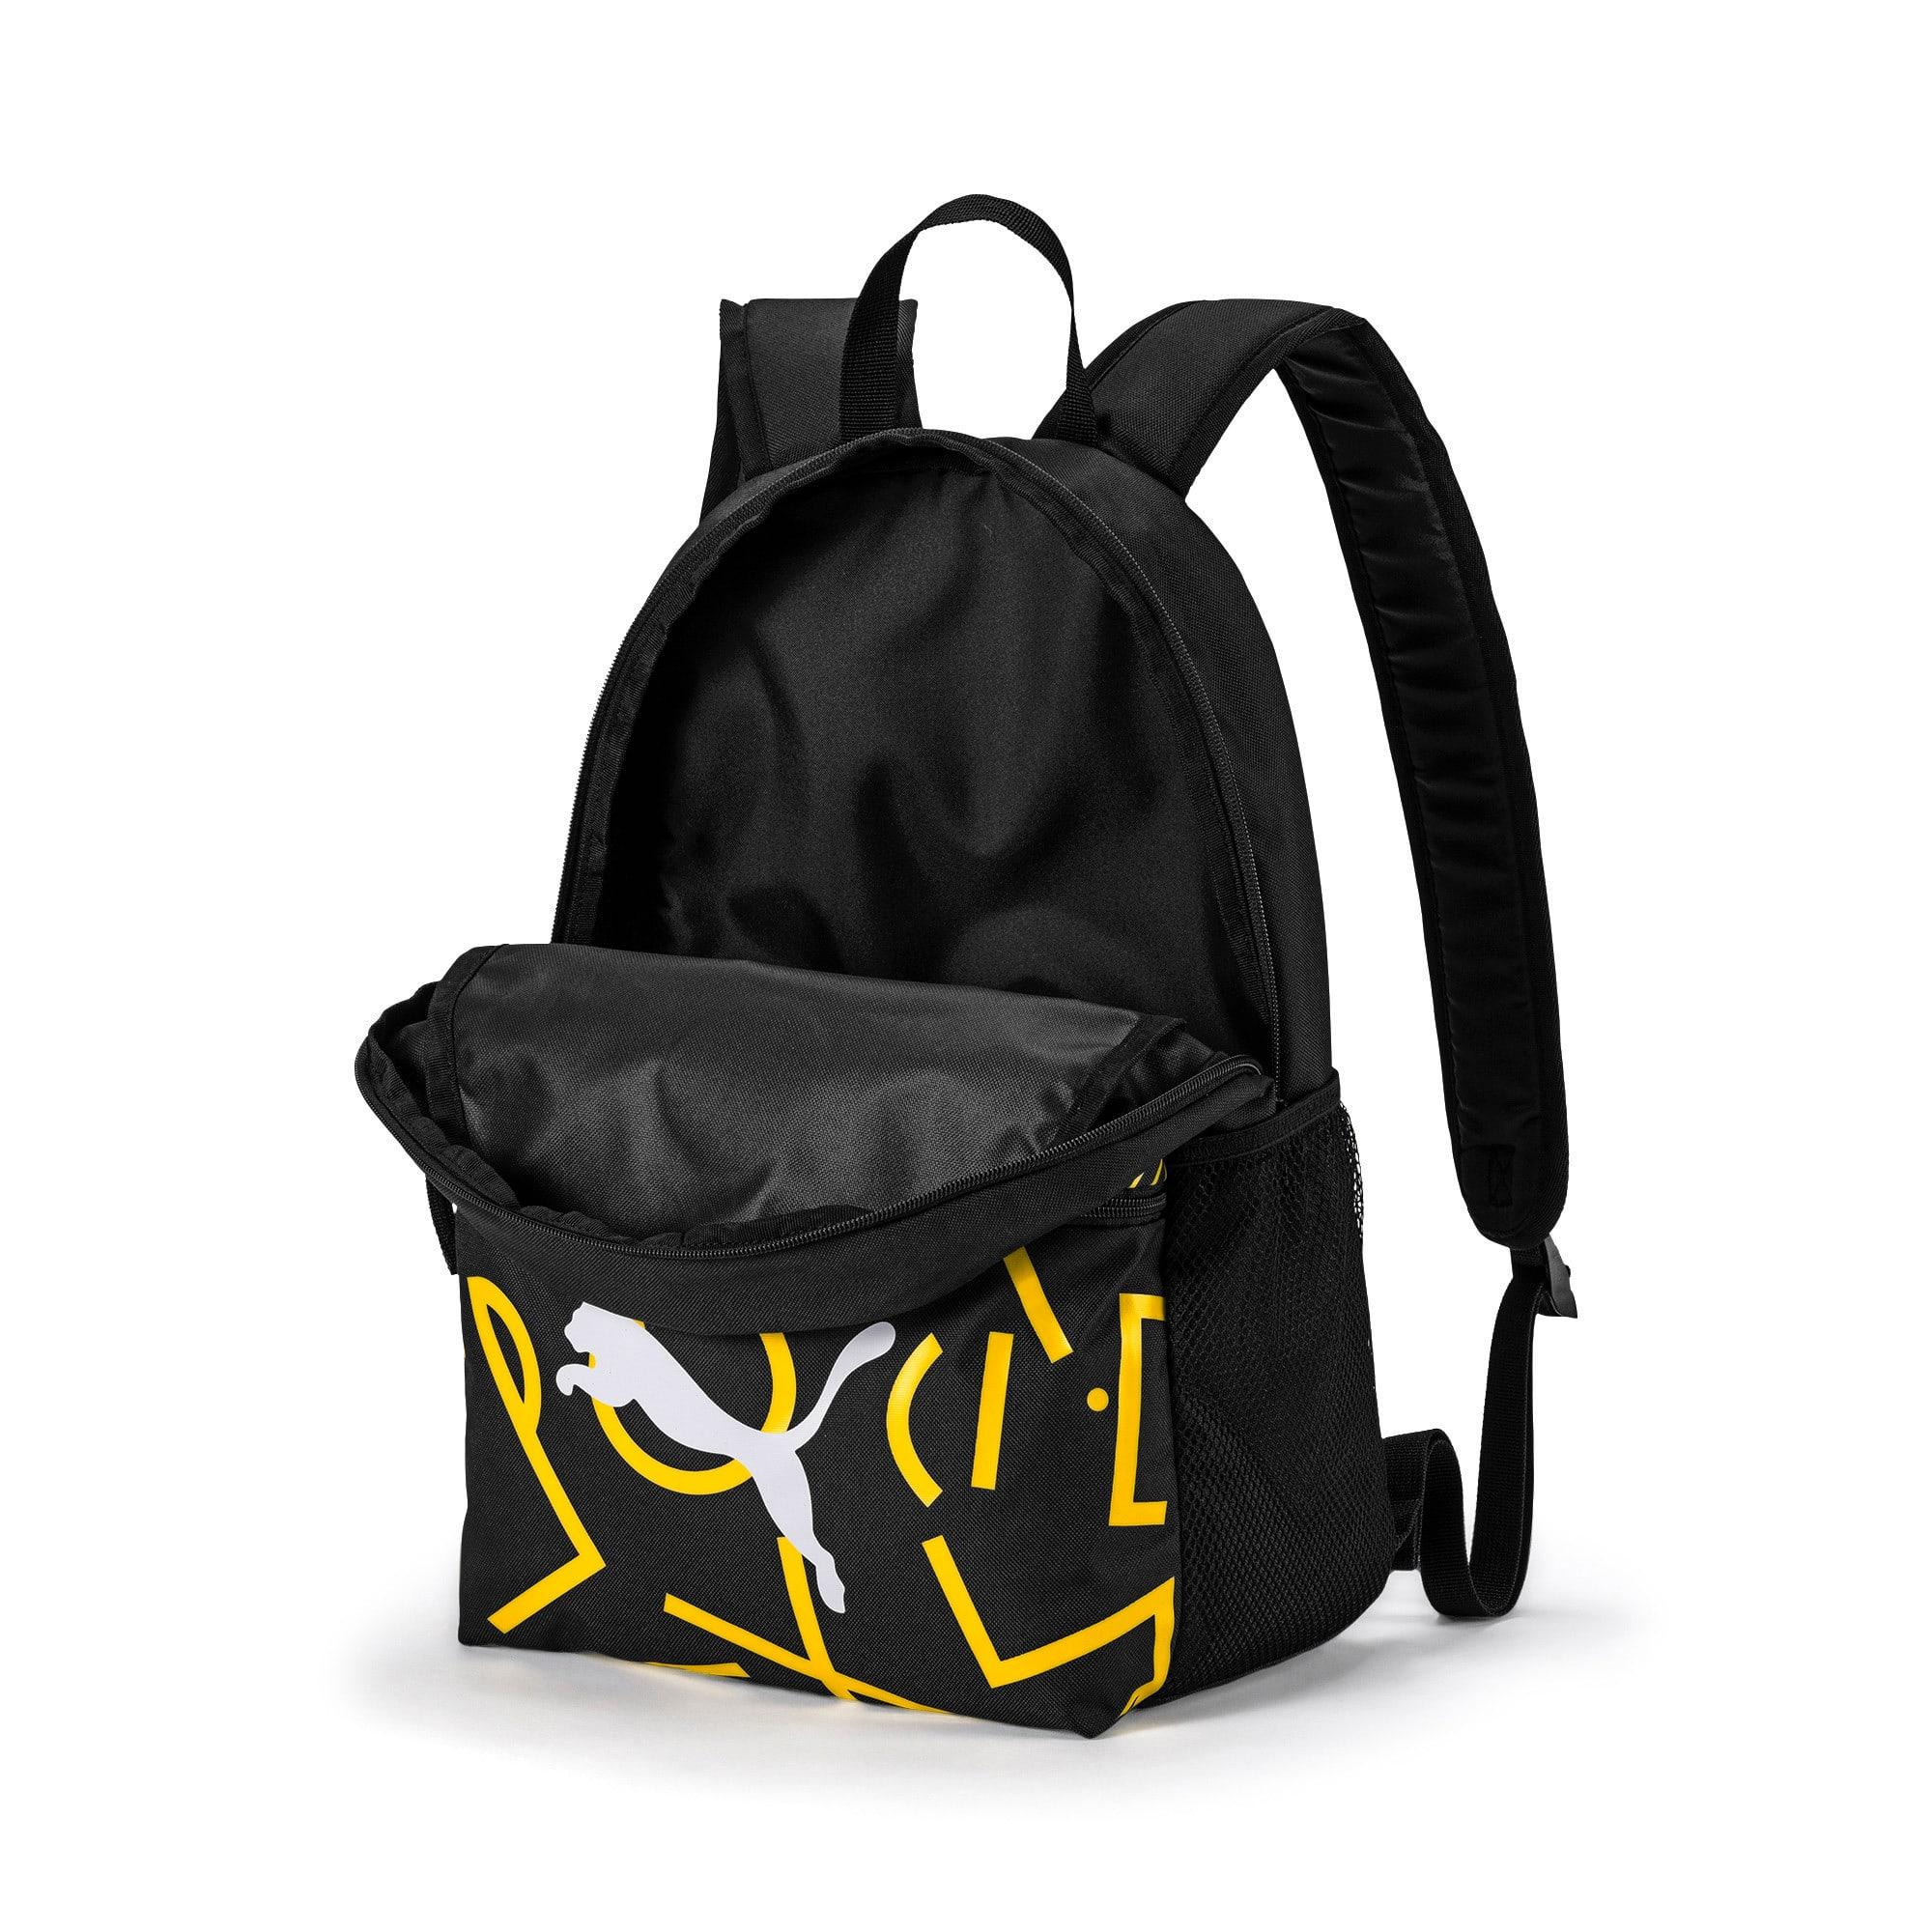 Thumbnail 3 of BVB DNA Backpack, Puma Black-Cyber Yellow, medium